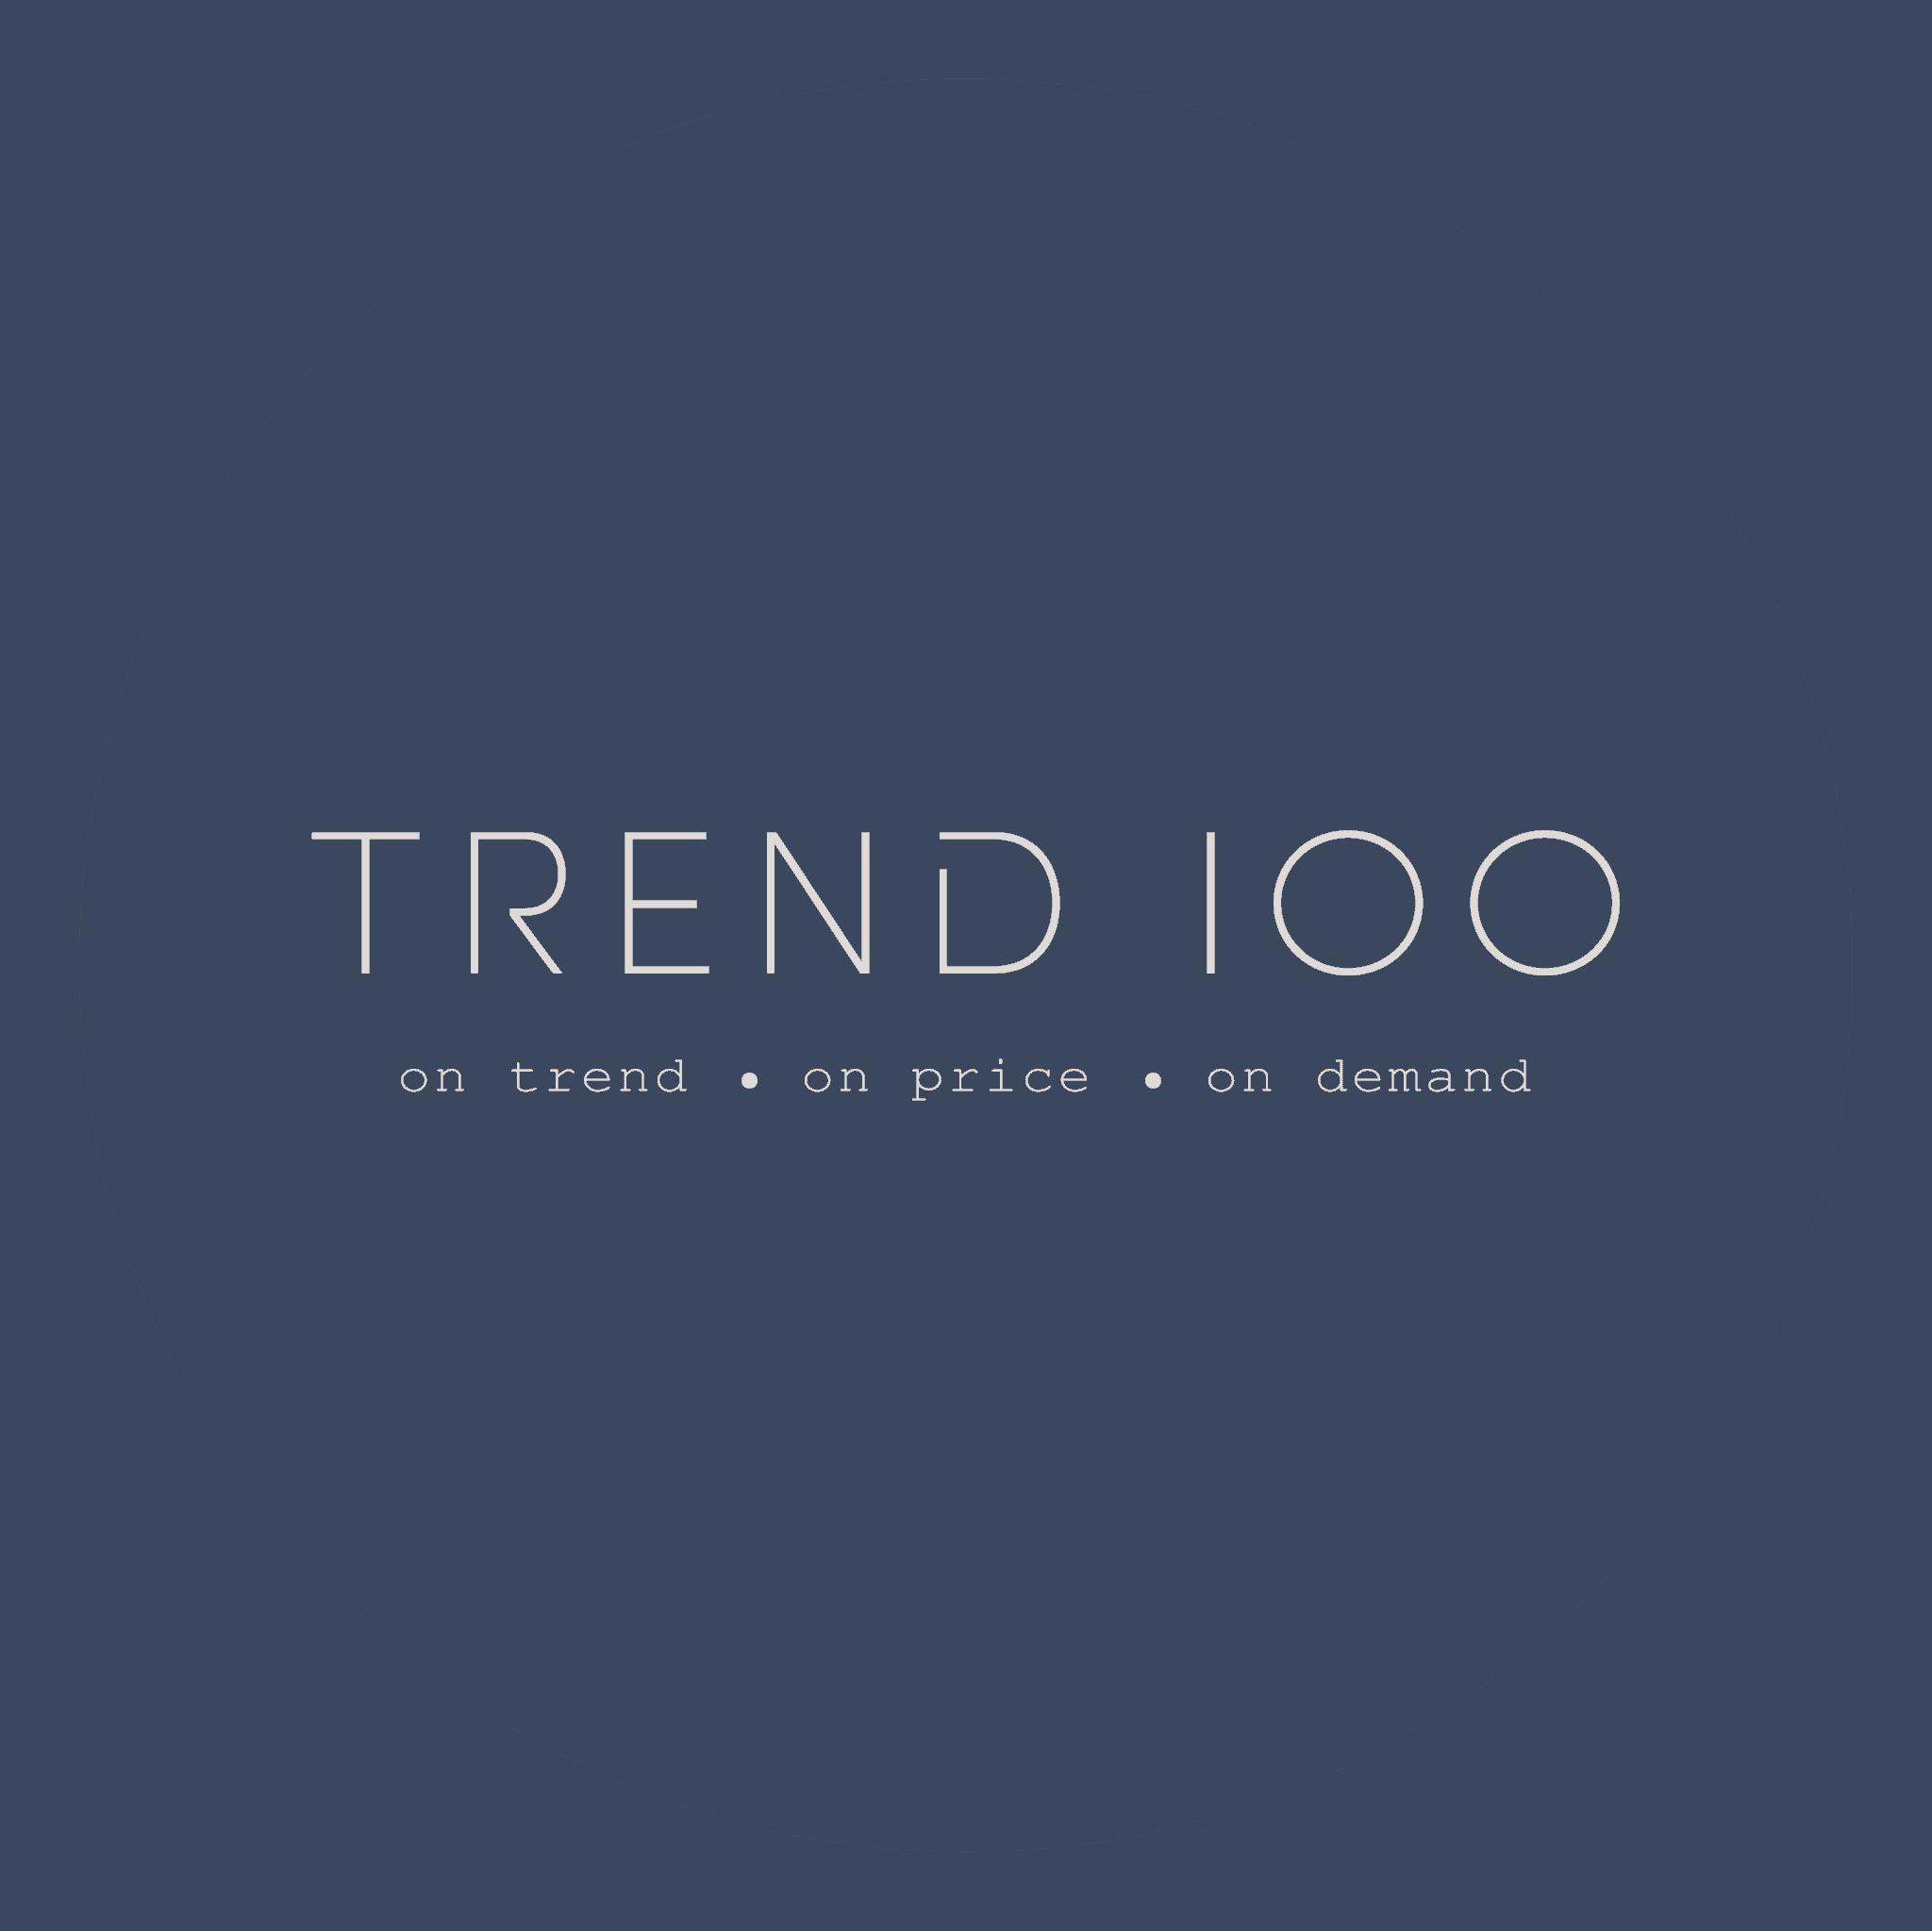 trend 100 logos all 03